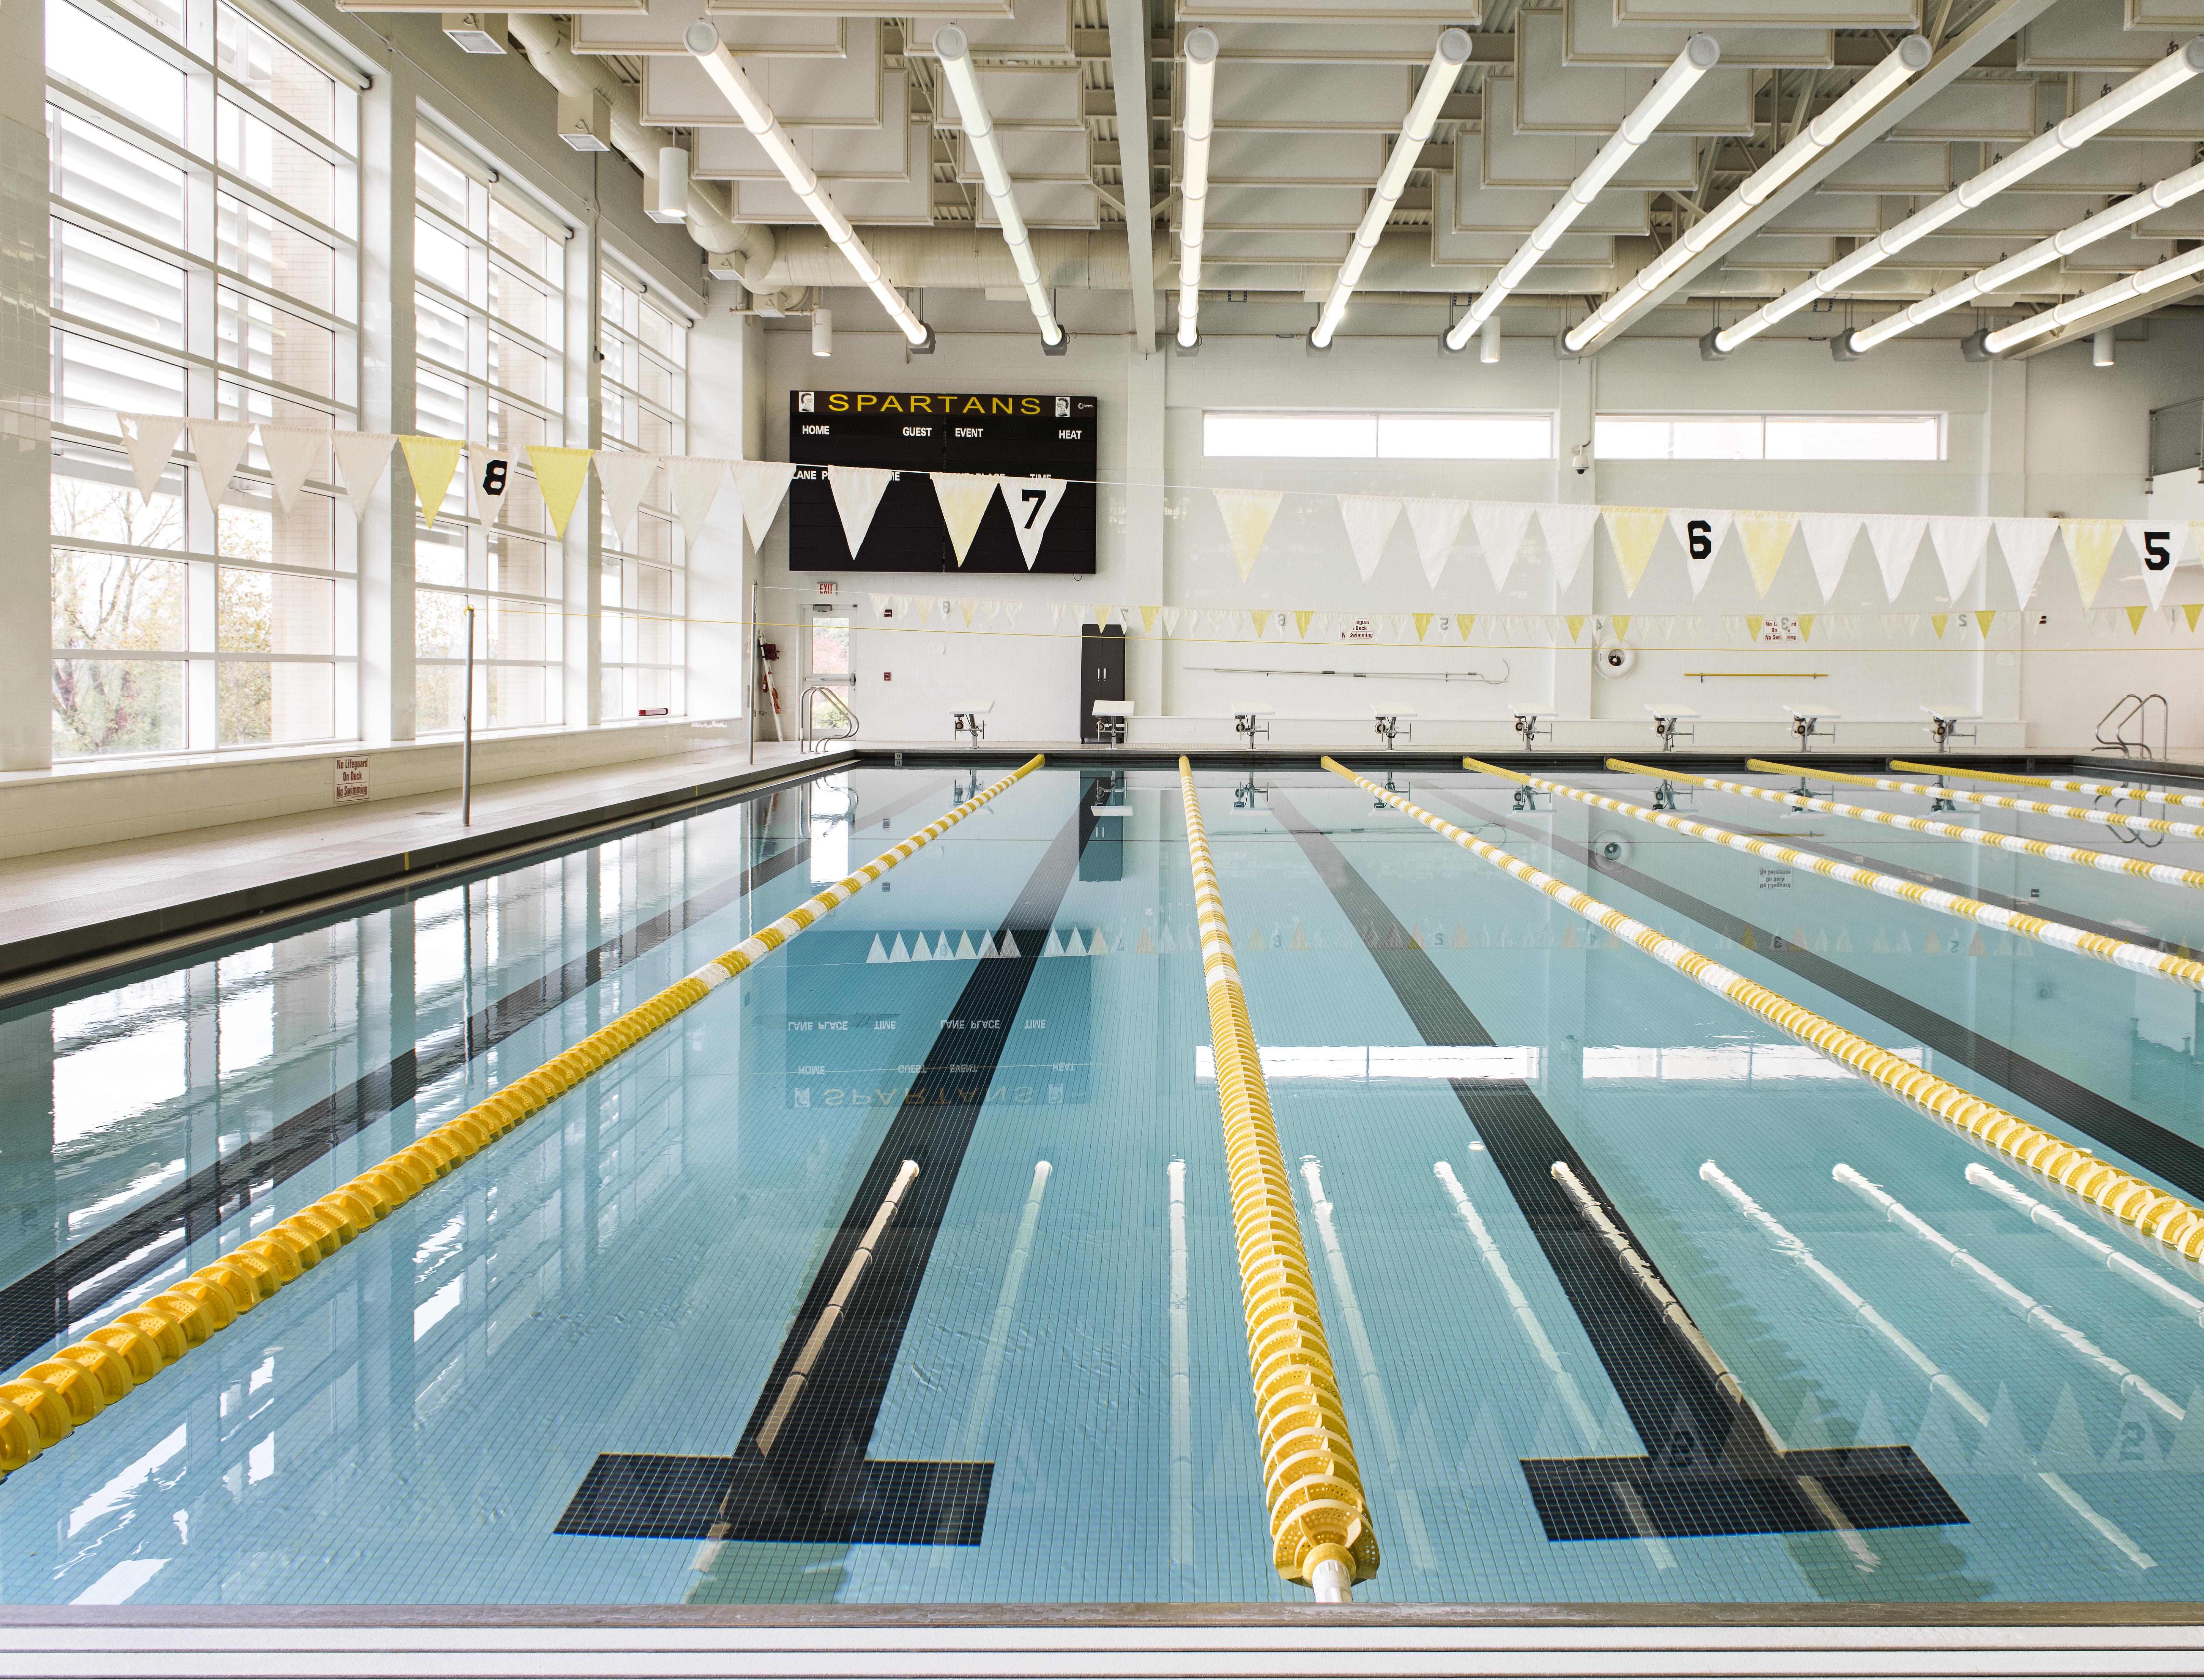 Athletics - Milton Hershey School